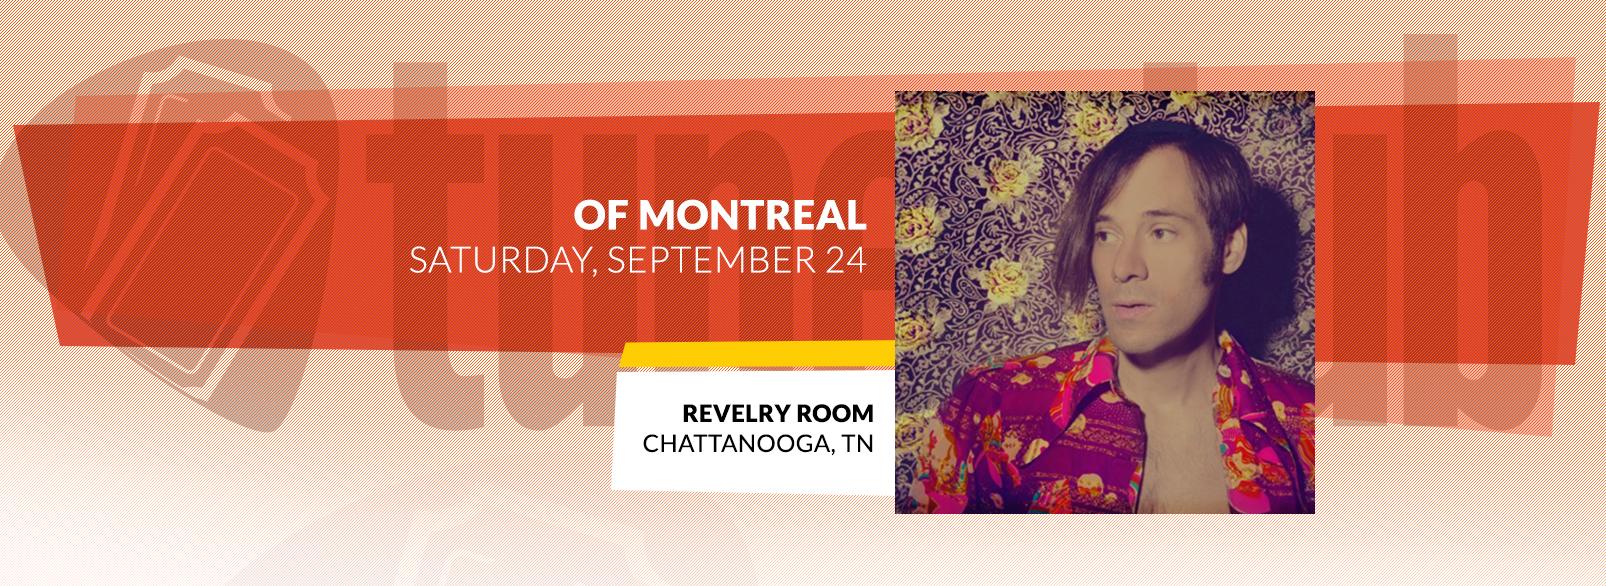 Of Montreal @ Revelry Room